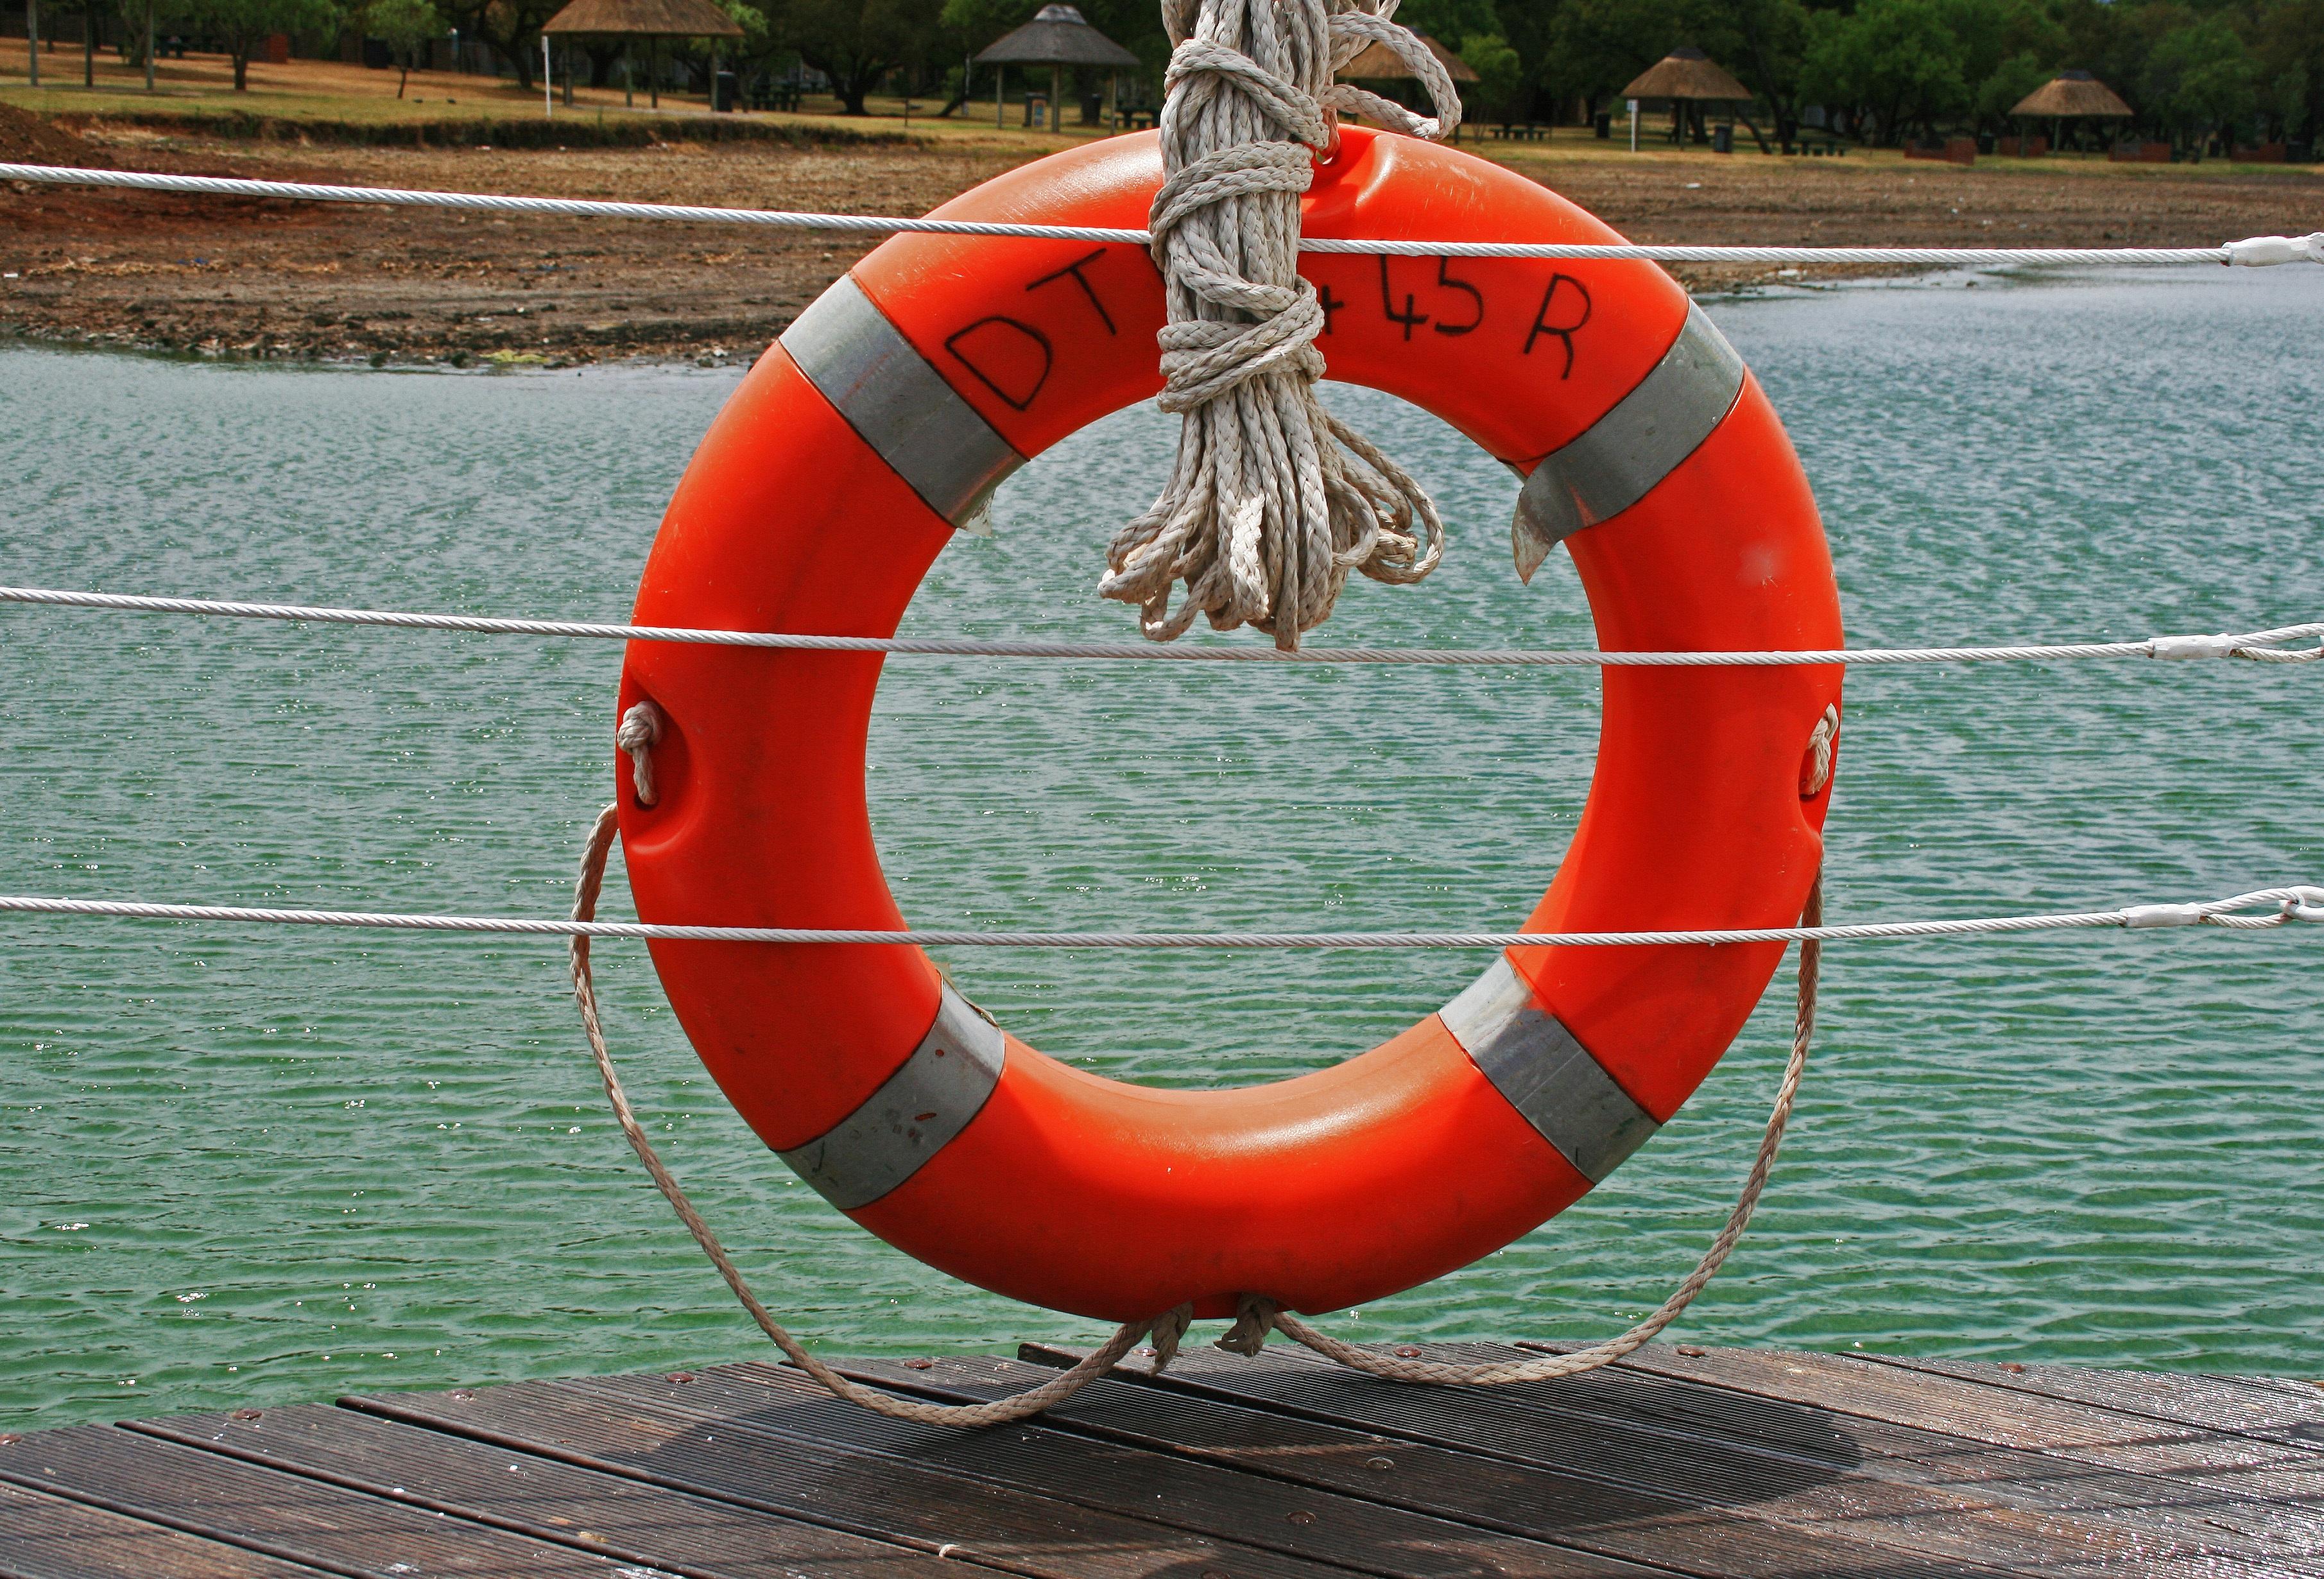 Free Images Water Boat Play Orange Vehicle Float